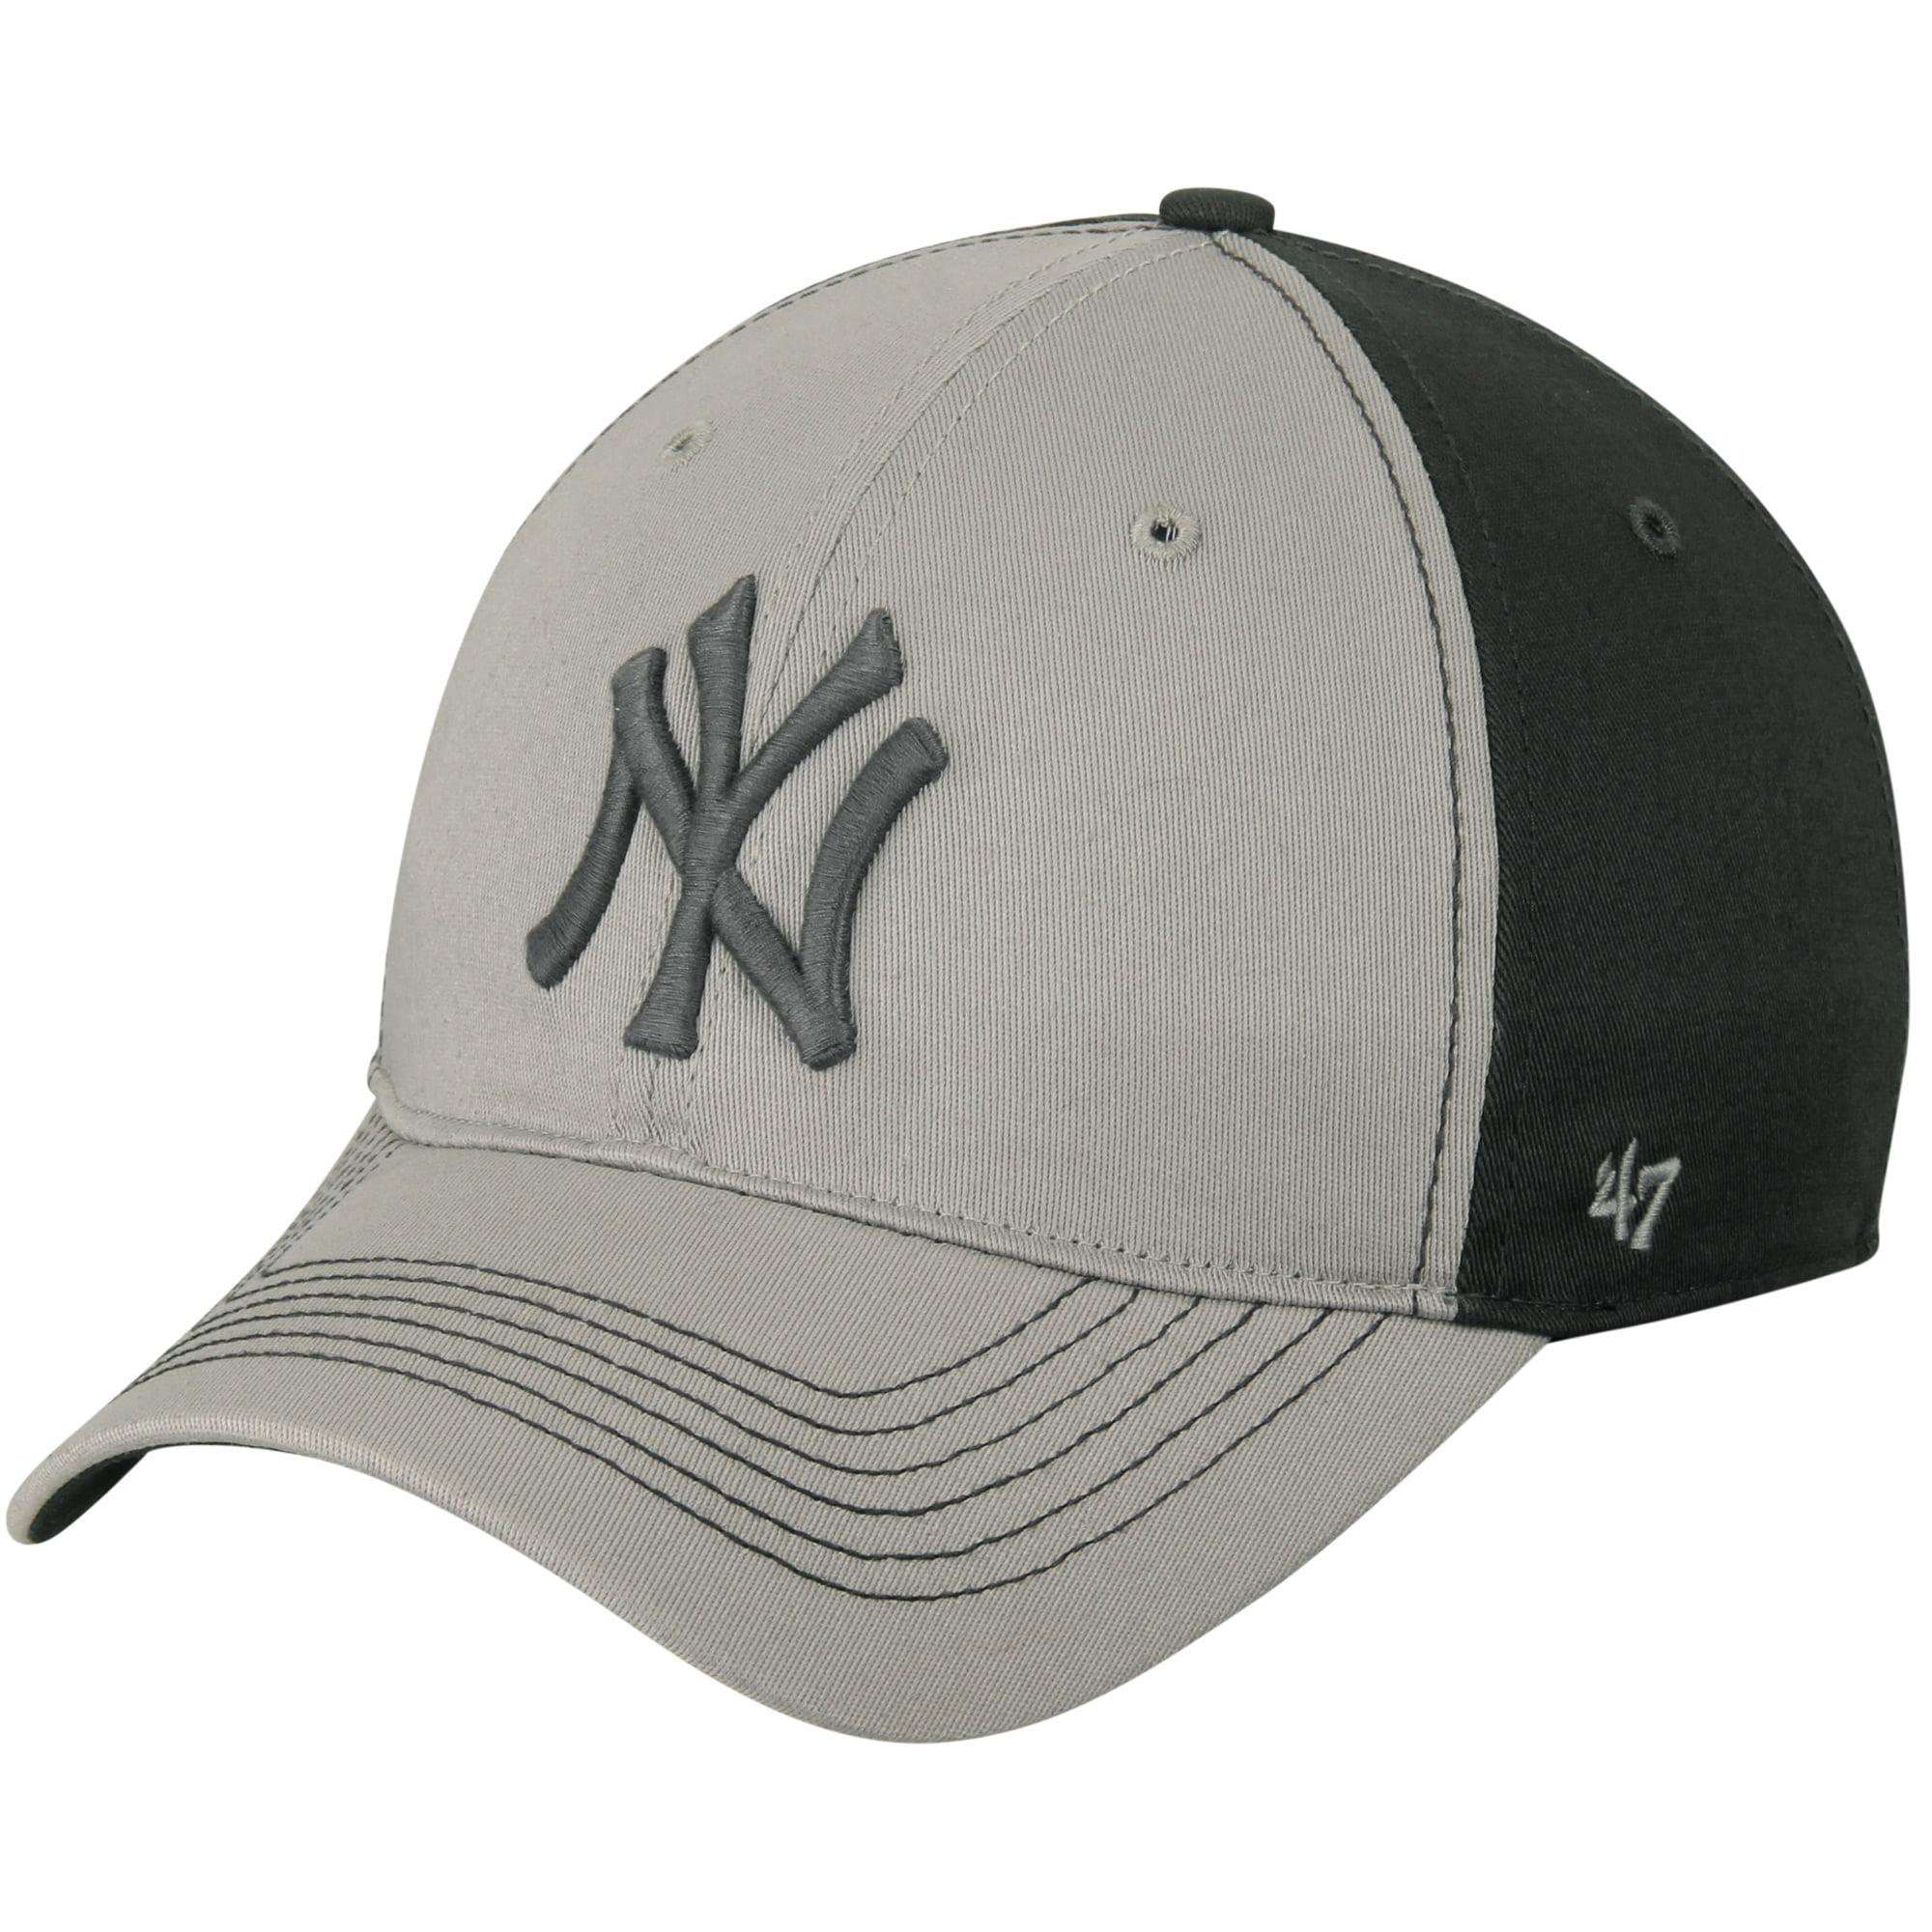 New York Yankees '47 Umbra Closer Flex Hat - Gray/Dark Gray - M/L